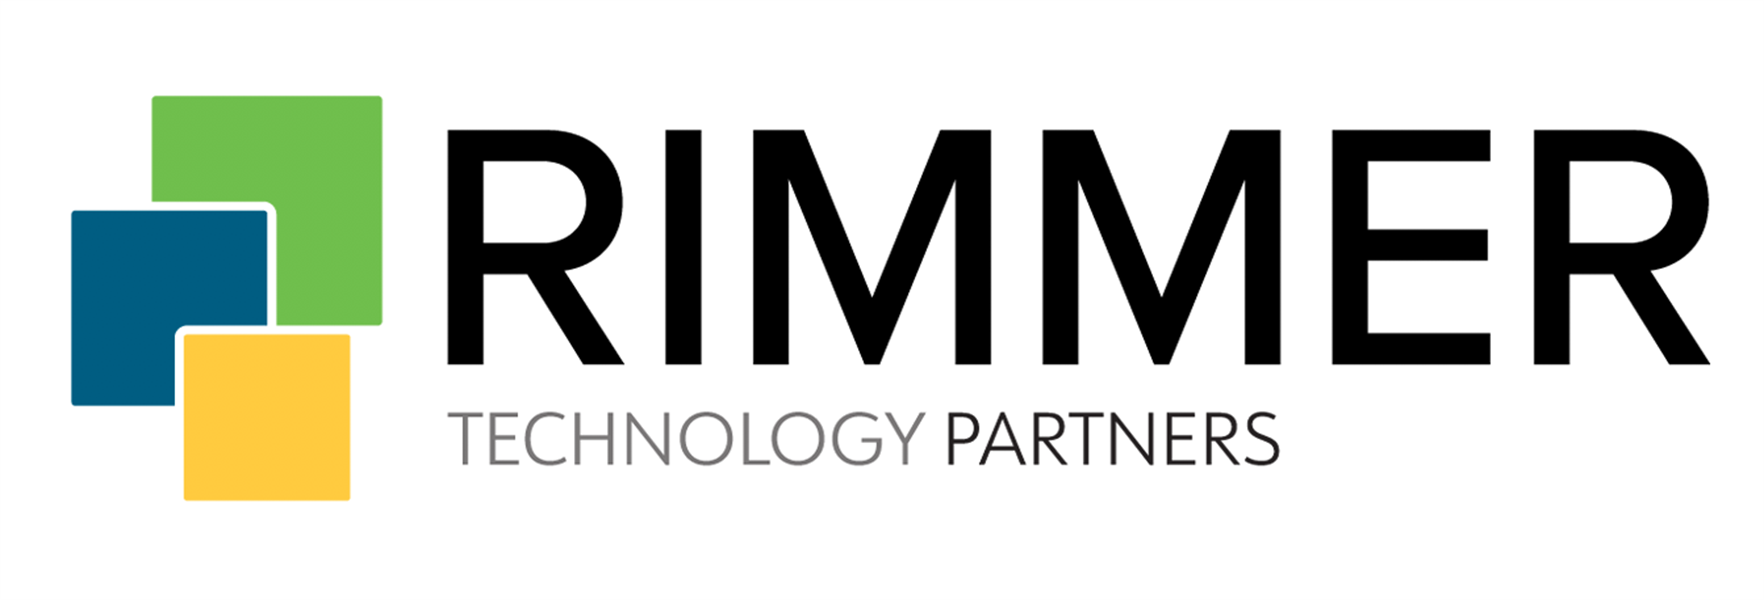 Rimmer Technology Partners